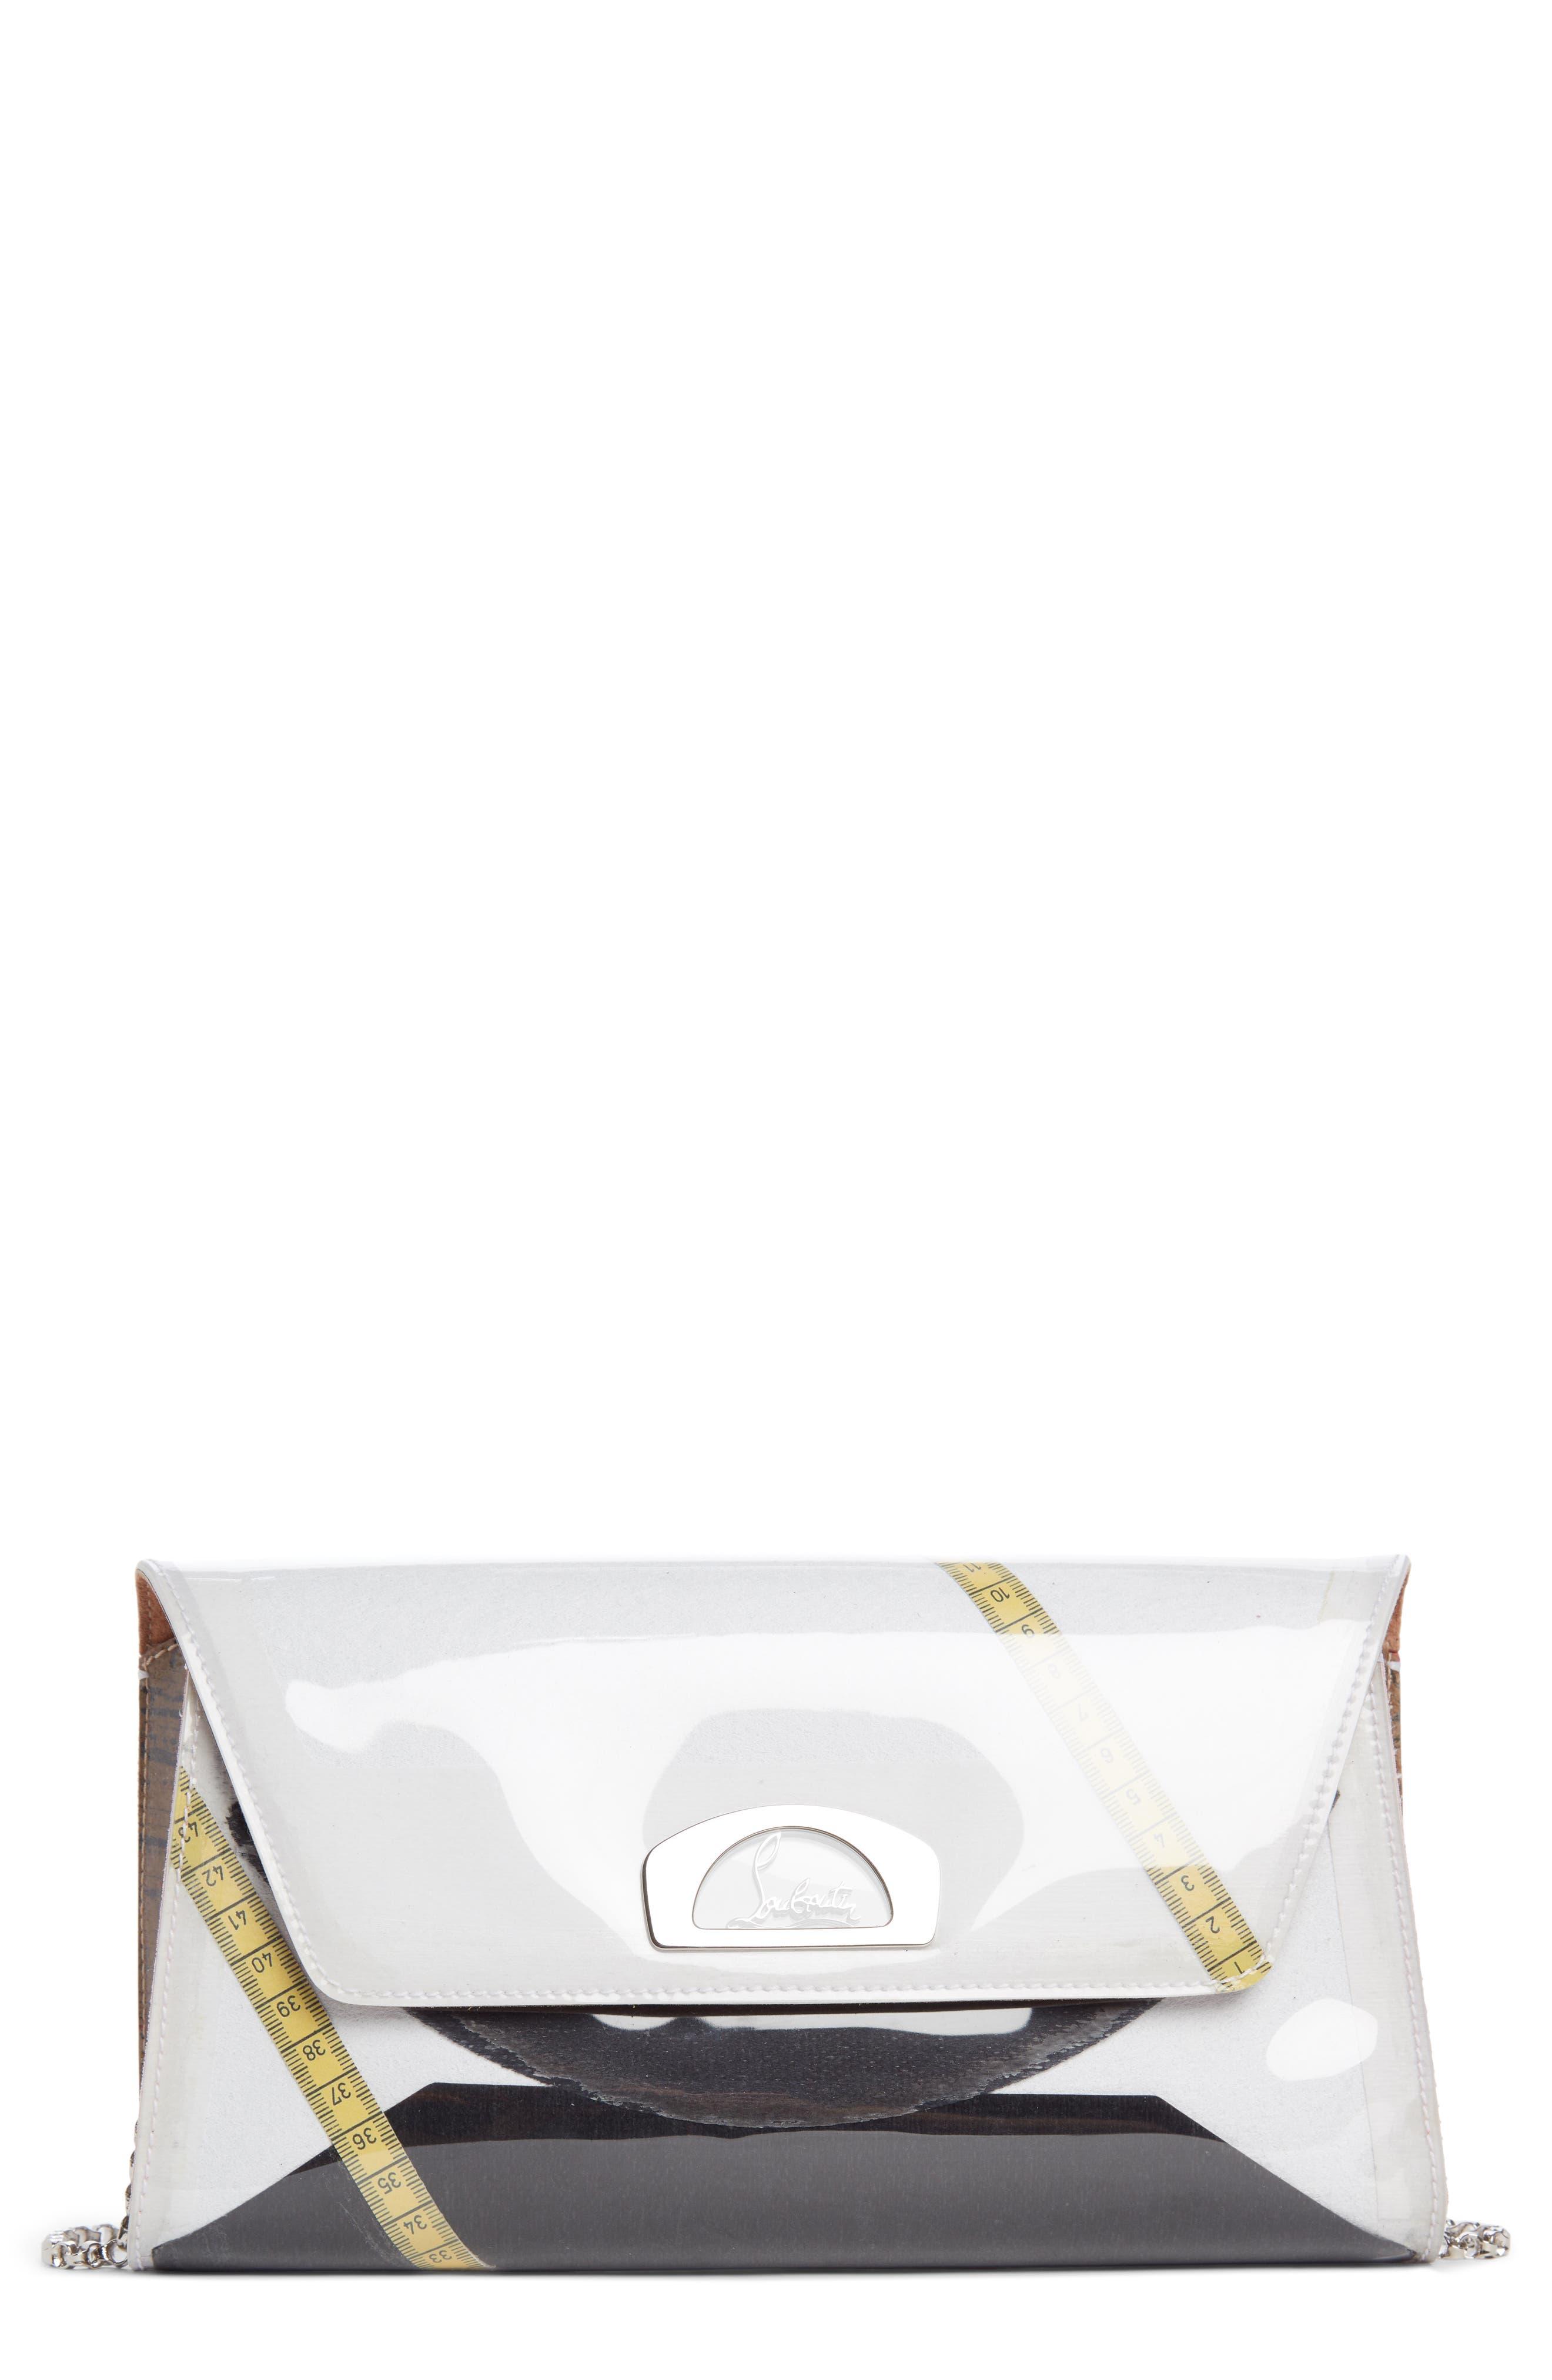 Vero Dodat Loubicouture Clutch,                         Main,                         color, White Multi